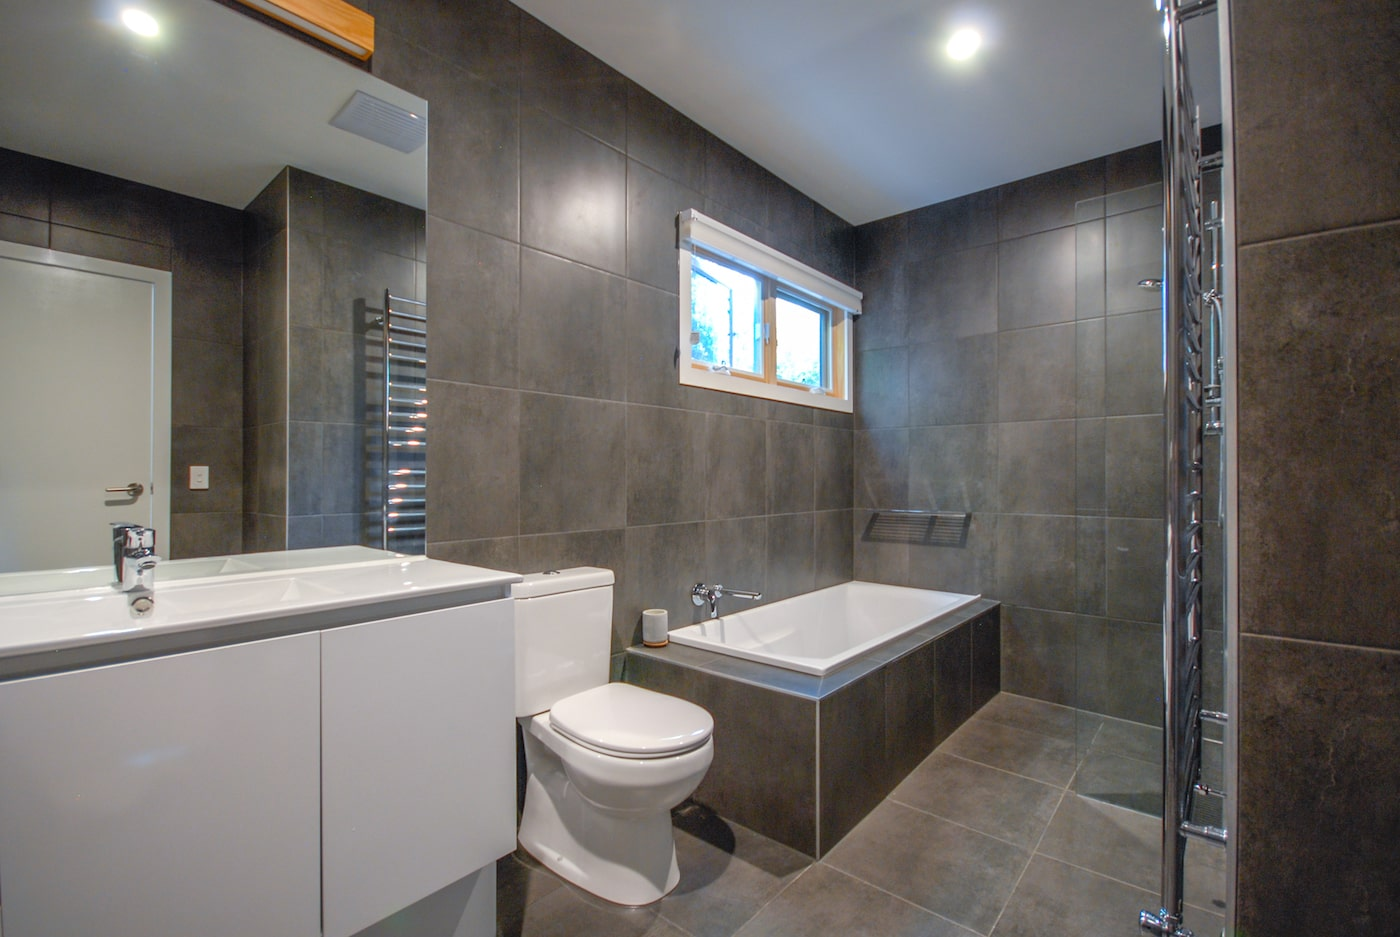 Dark grey tiled bathroom with white vanity